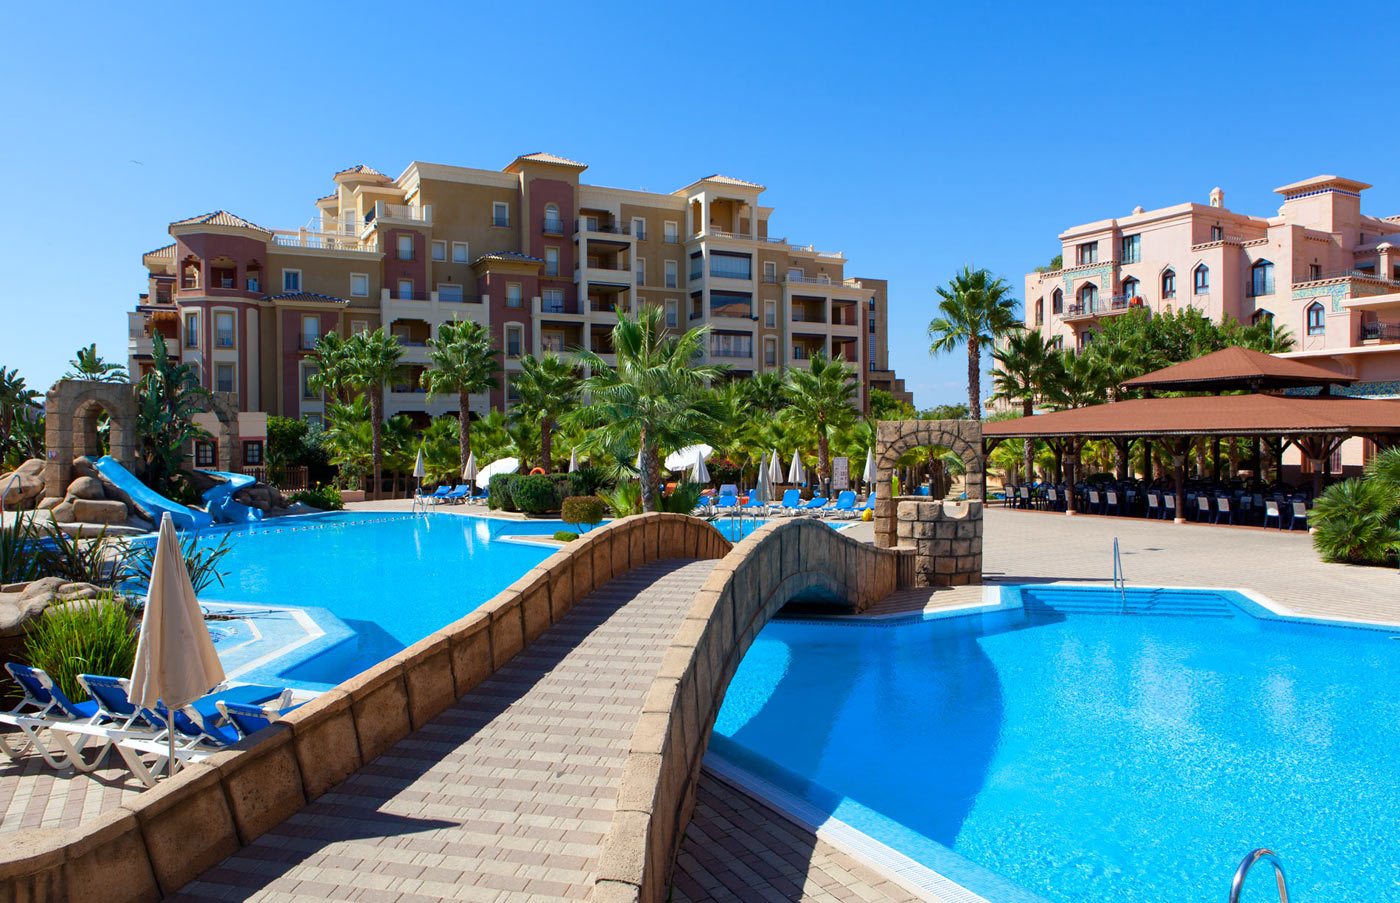 Hoteles con toboganes acu ticos escapat - Hoteles en huesca con piscina ...